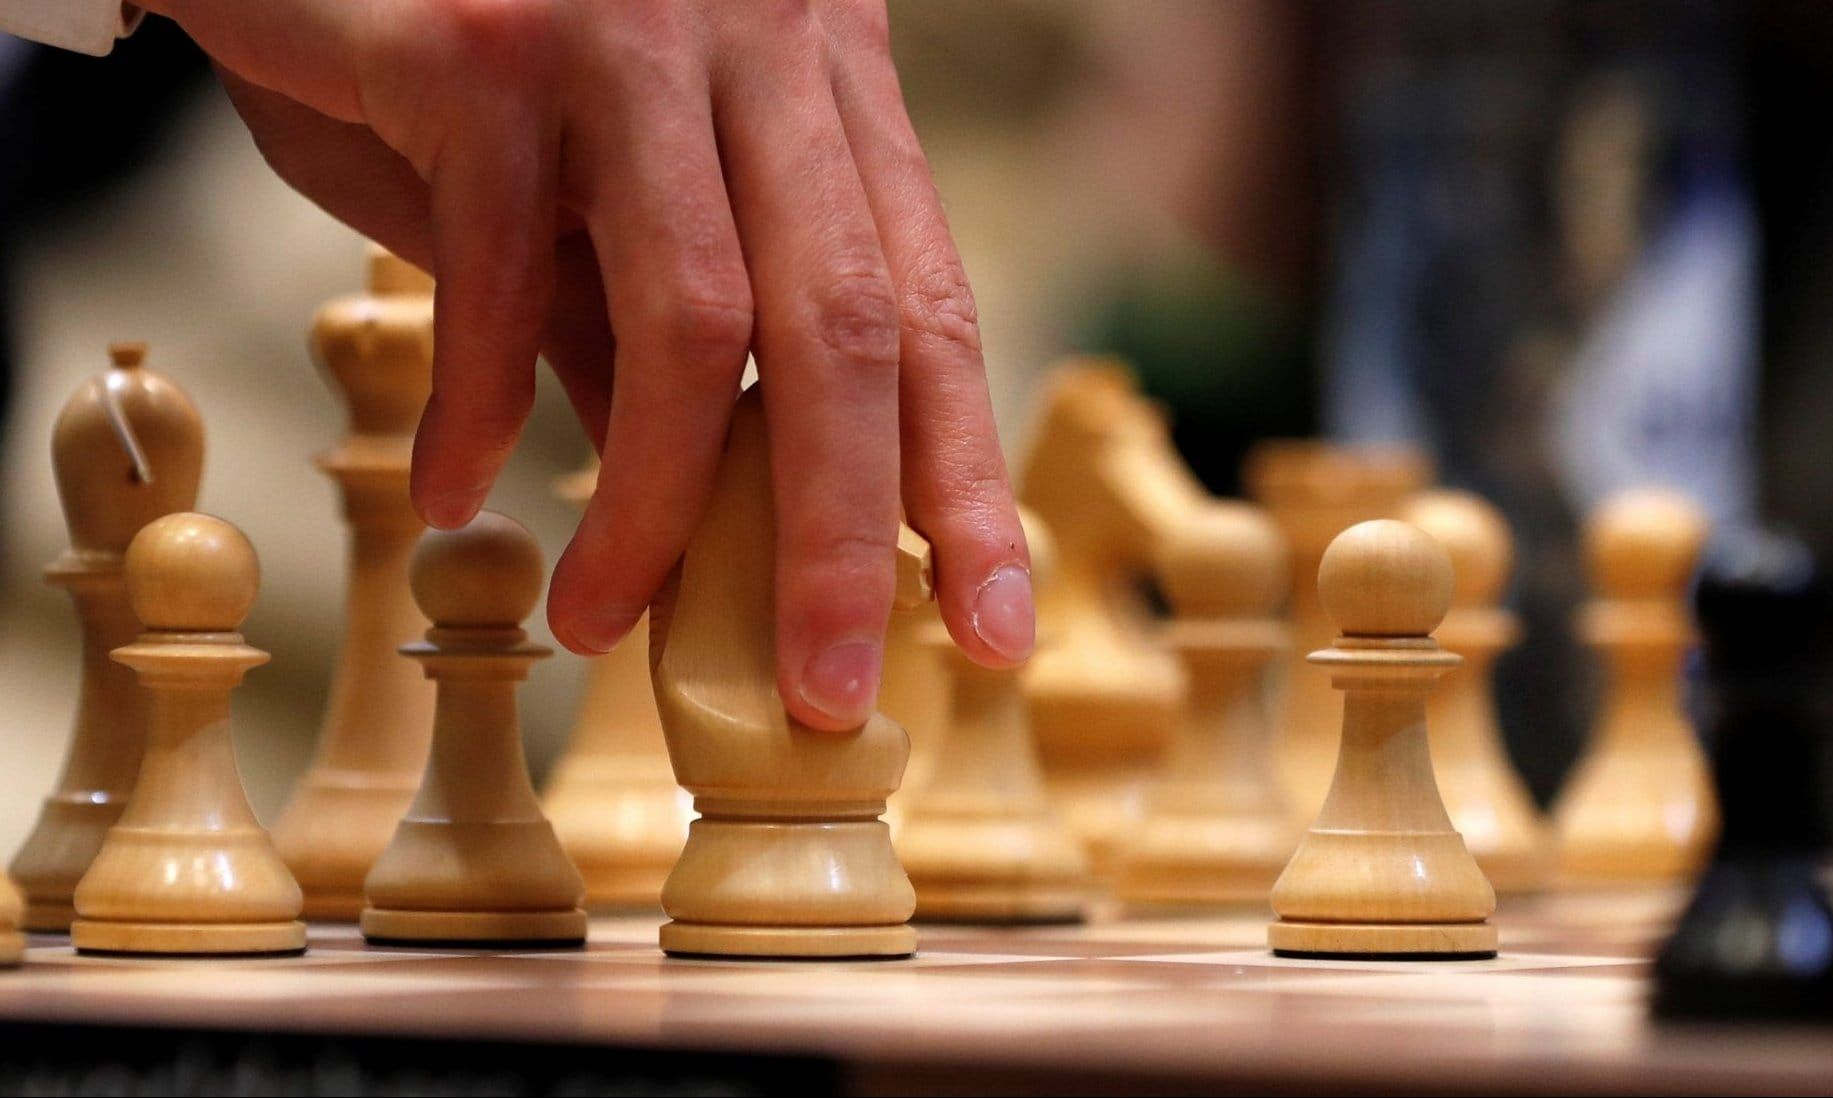 mossa scacchi